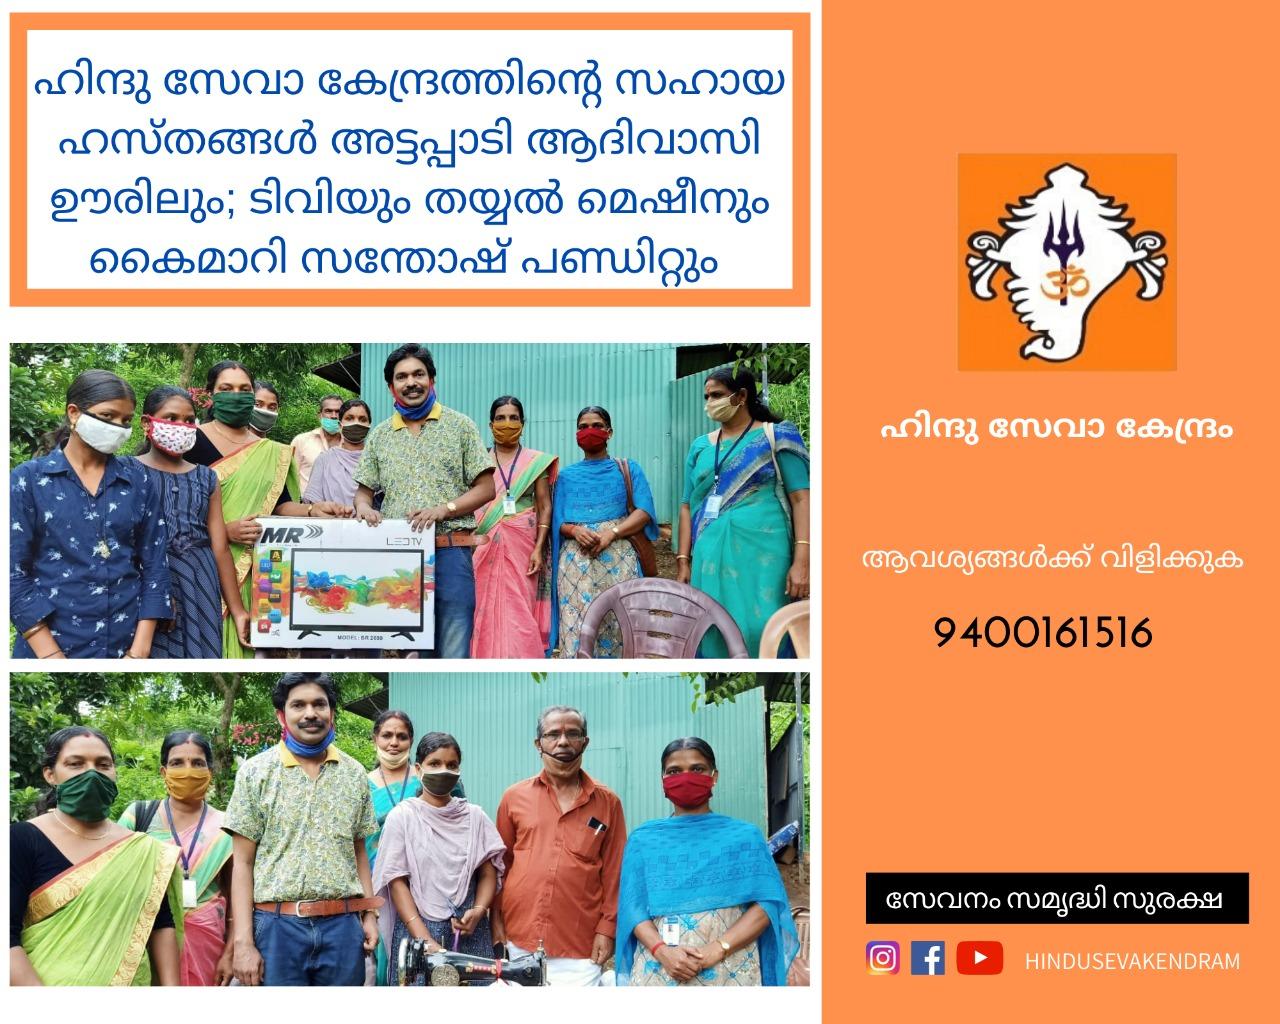 Ekal Vidyalayam extends support to Attappady tribal community; Santosh Pandit hands over and Hindu Seva Kendram coordinates